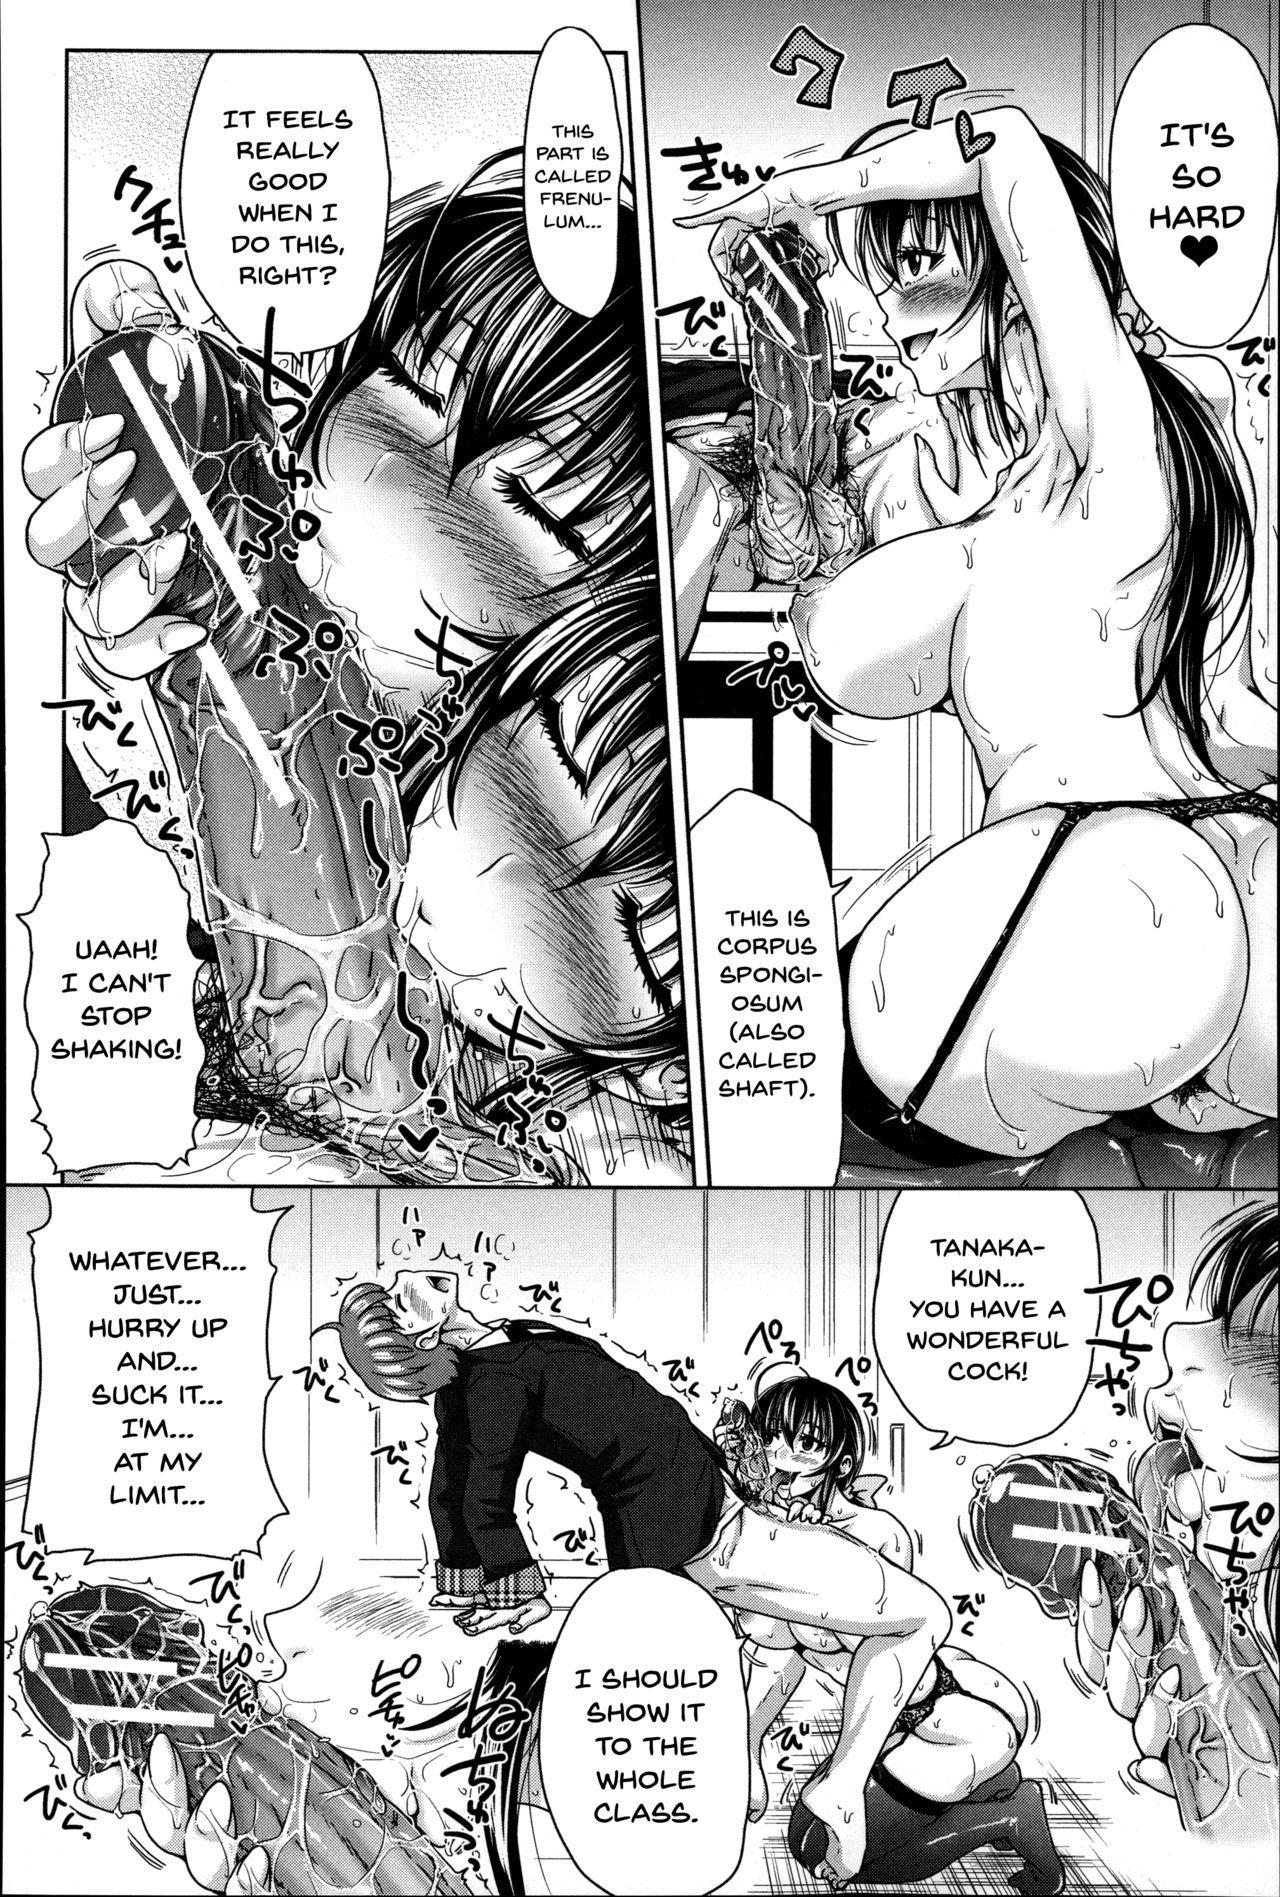 Pakotate! Seikouritsu 0% no Teppeki Bishojo VS Seikouritsu 100% no Hentai Katei Kyoushi   Pakotate! Sex Rate 0% Iron-Willed Beautiful Virgins VS Sex Rate 100% Perverted Coach 91